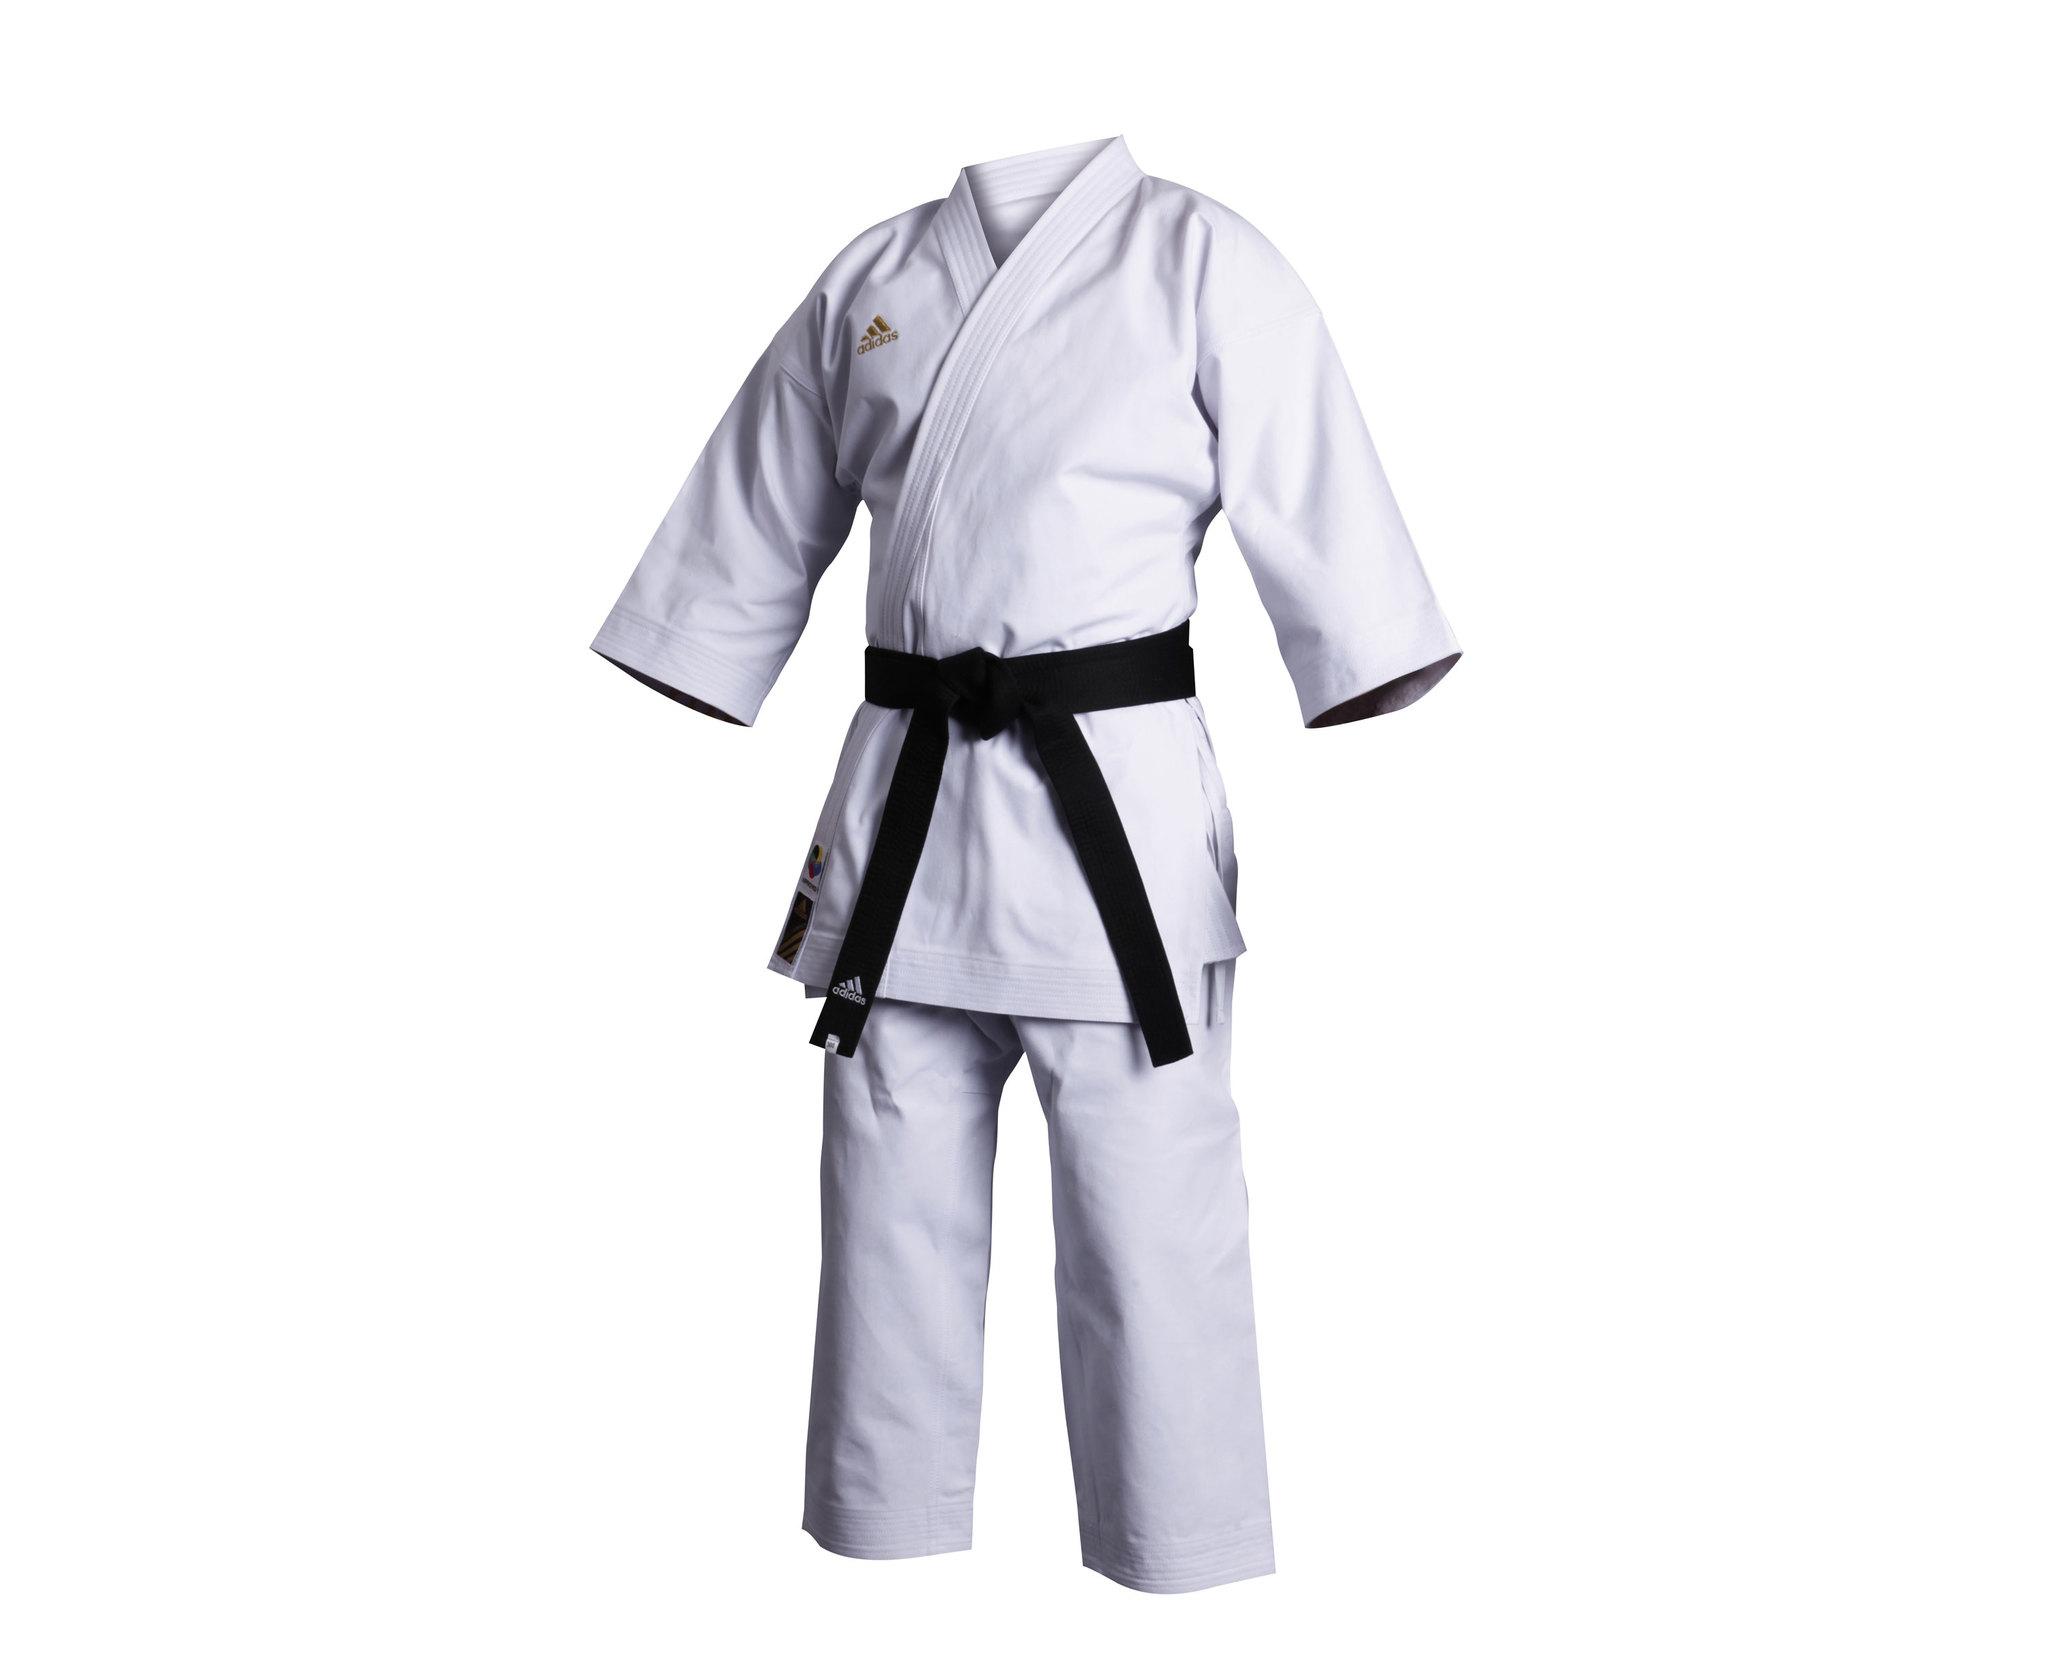 Кимоно КИМОНО ДЛЯ КАРАТЕ CHAMPION EUROPEAN CUT WKF БЕЛОЕ kimono_dlya_karate_champion_european_cut_wkf_beloe.jpg